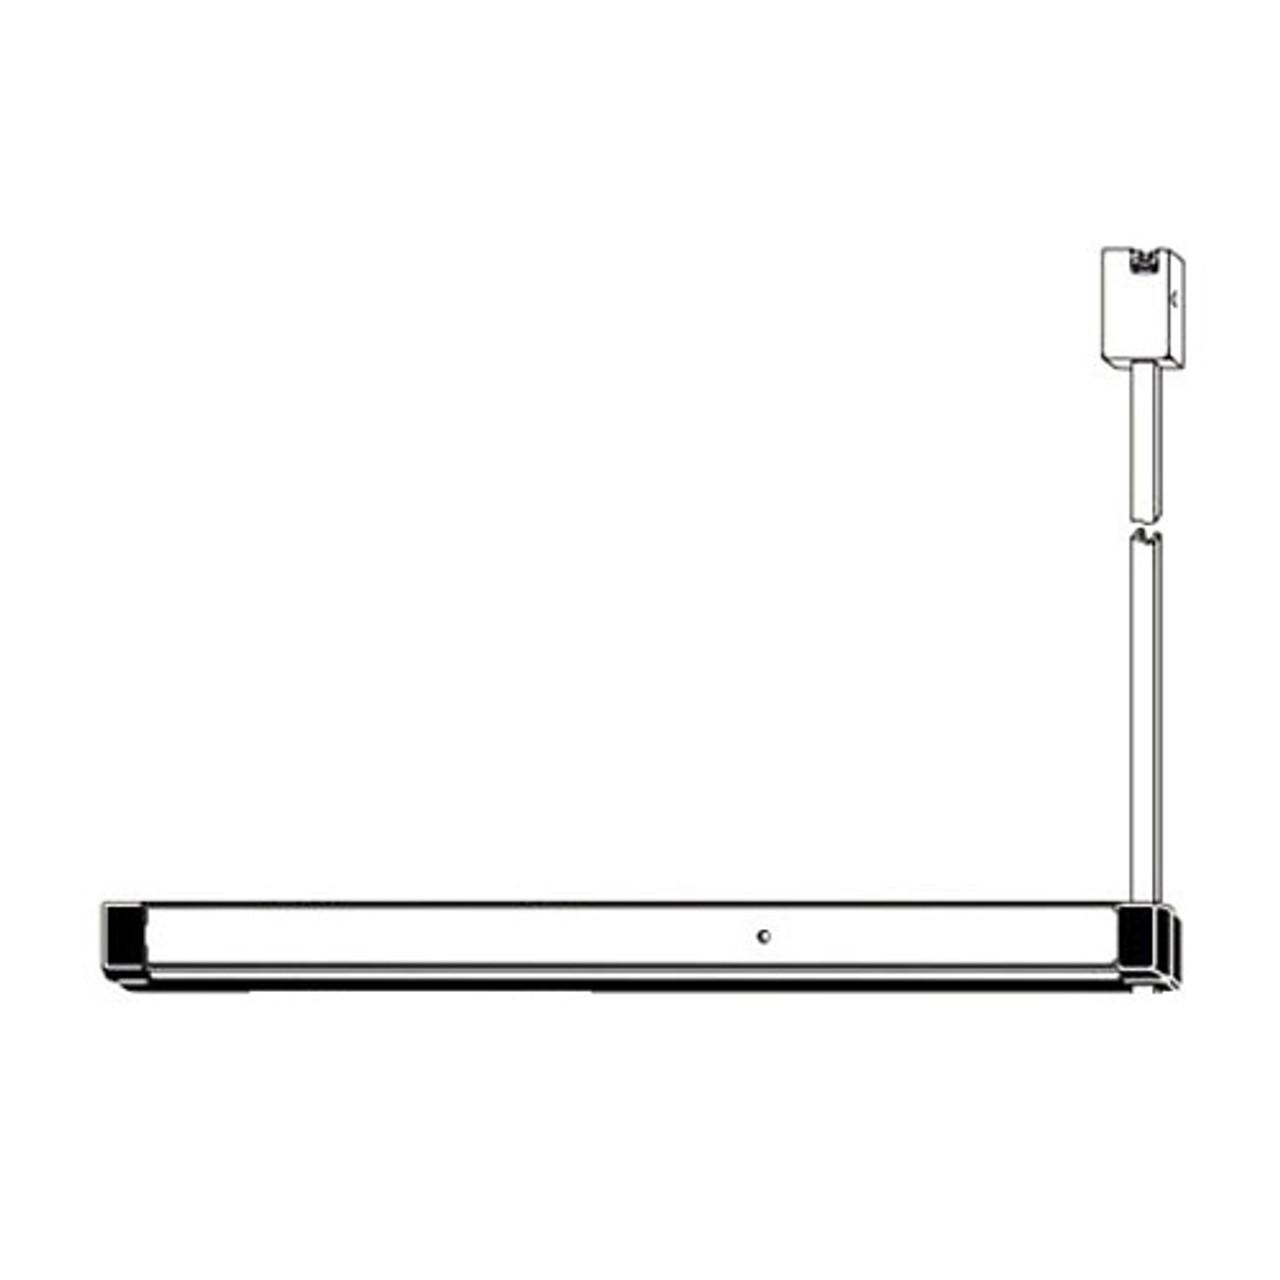 8222T-MLR-42 Adams Rite Narrow Stile Surface Vertical Rod Exit Device in Dark Bronze